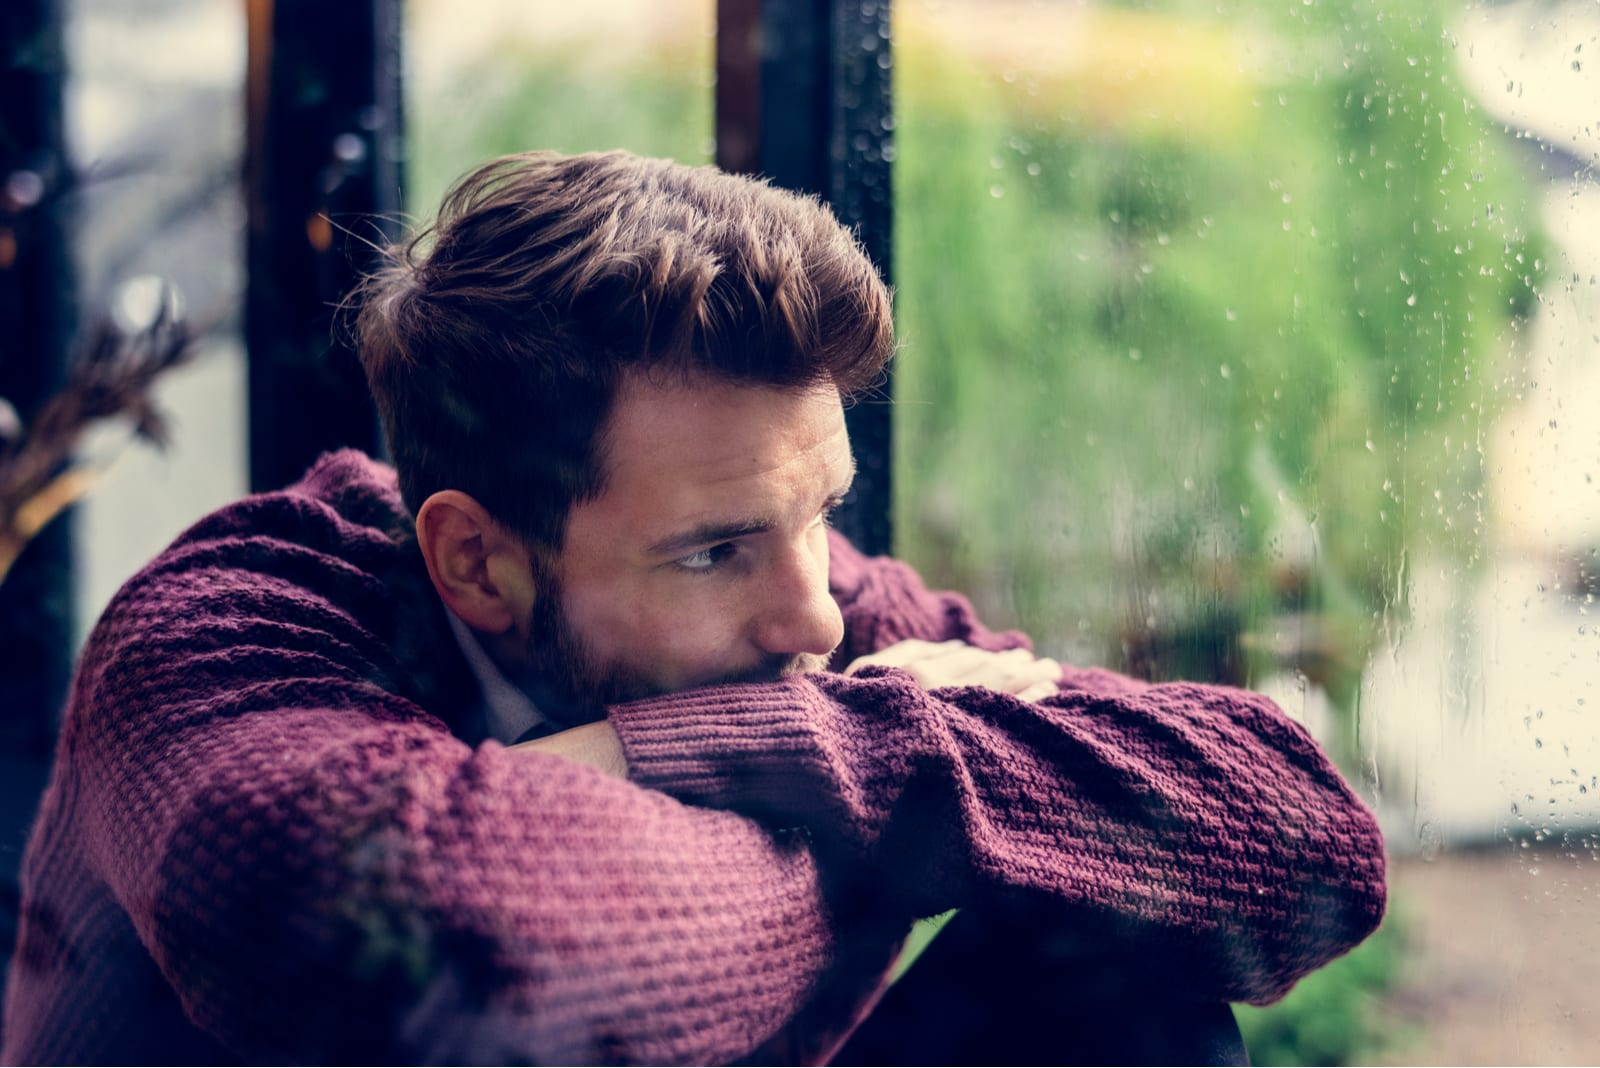 sad man looking through the rainy window